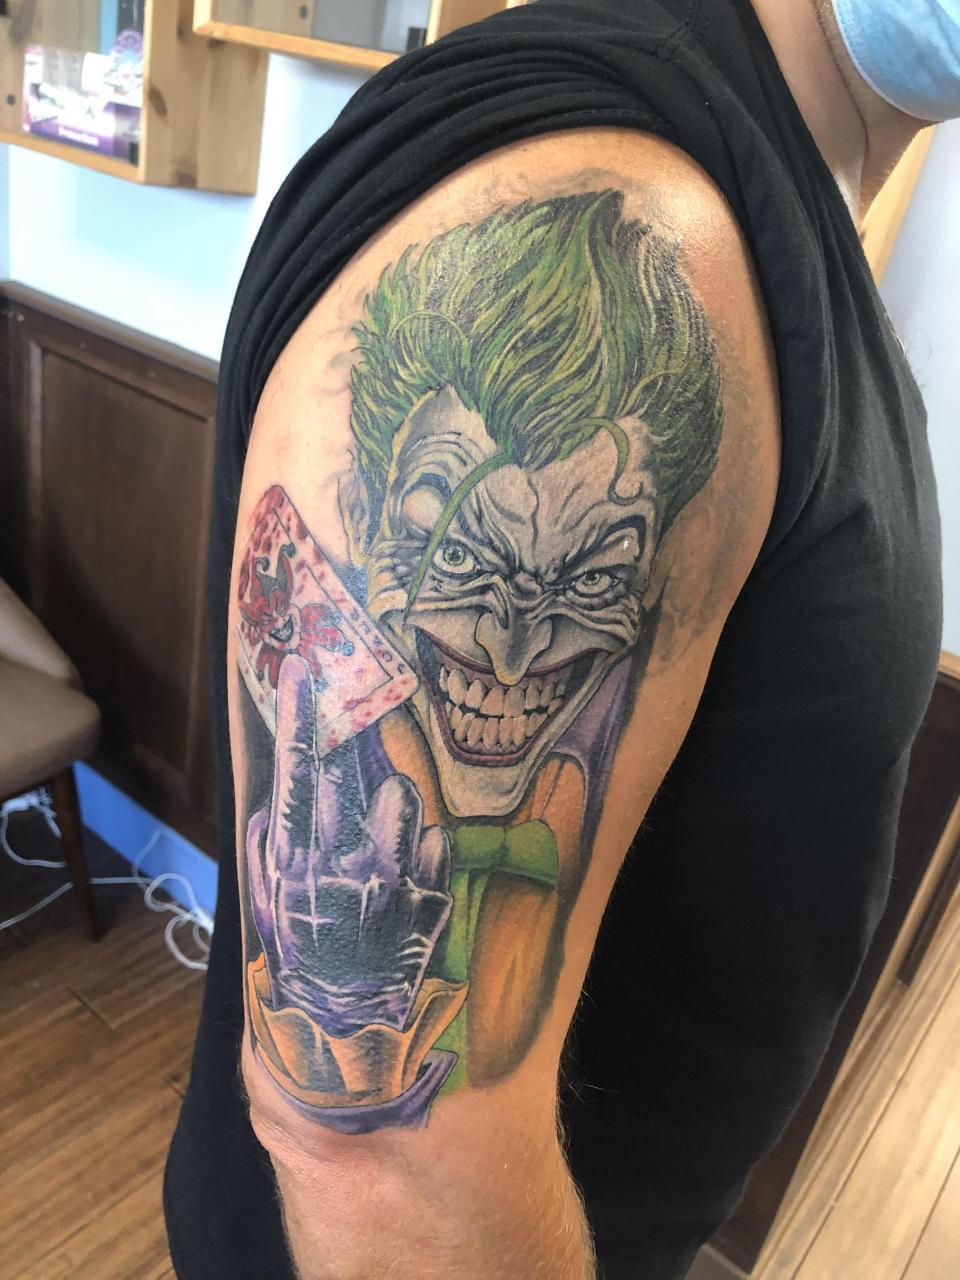 Joker tattoo. Comics version